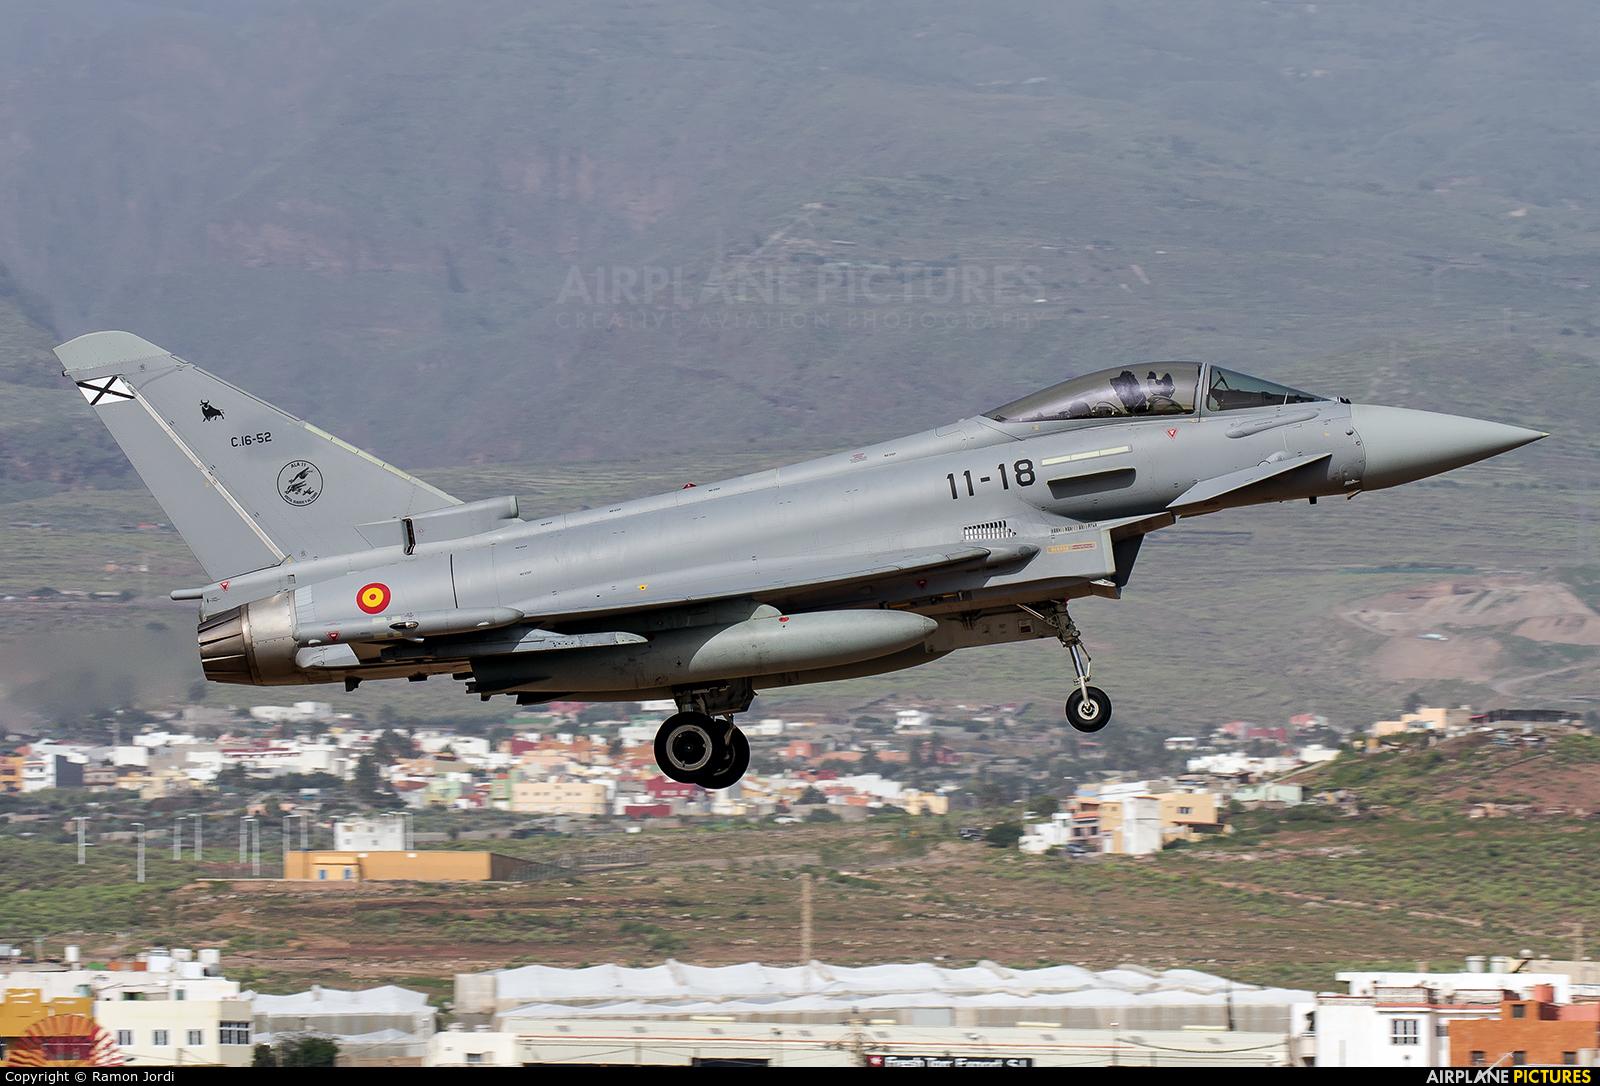 Spain - Air Force C.16-52 aircraft at Las Palmas de Gran Canaria